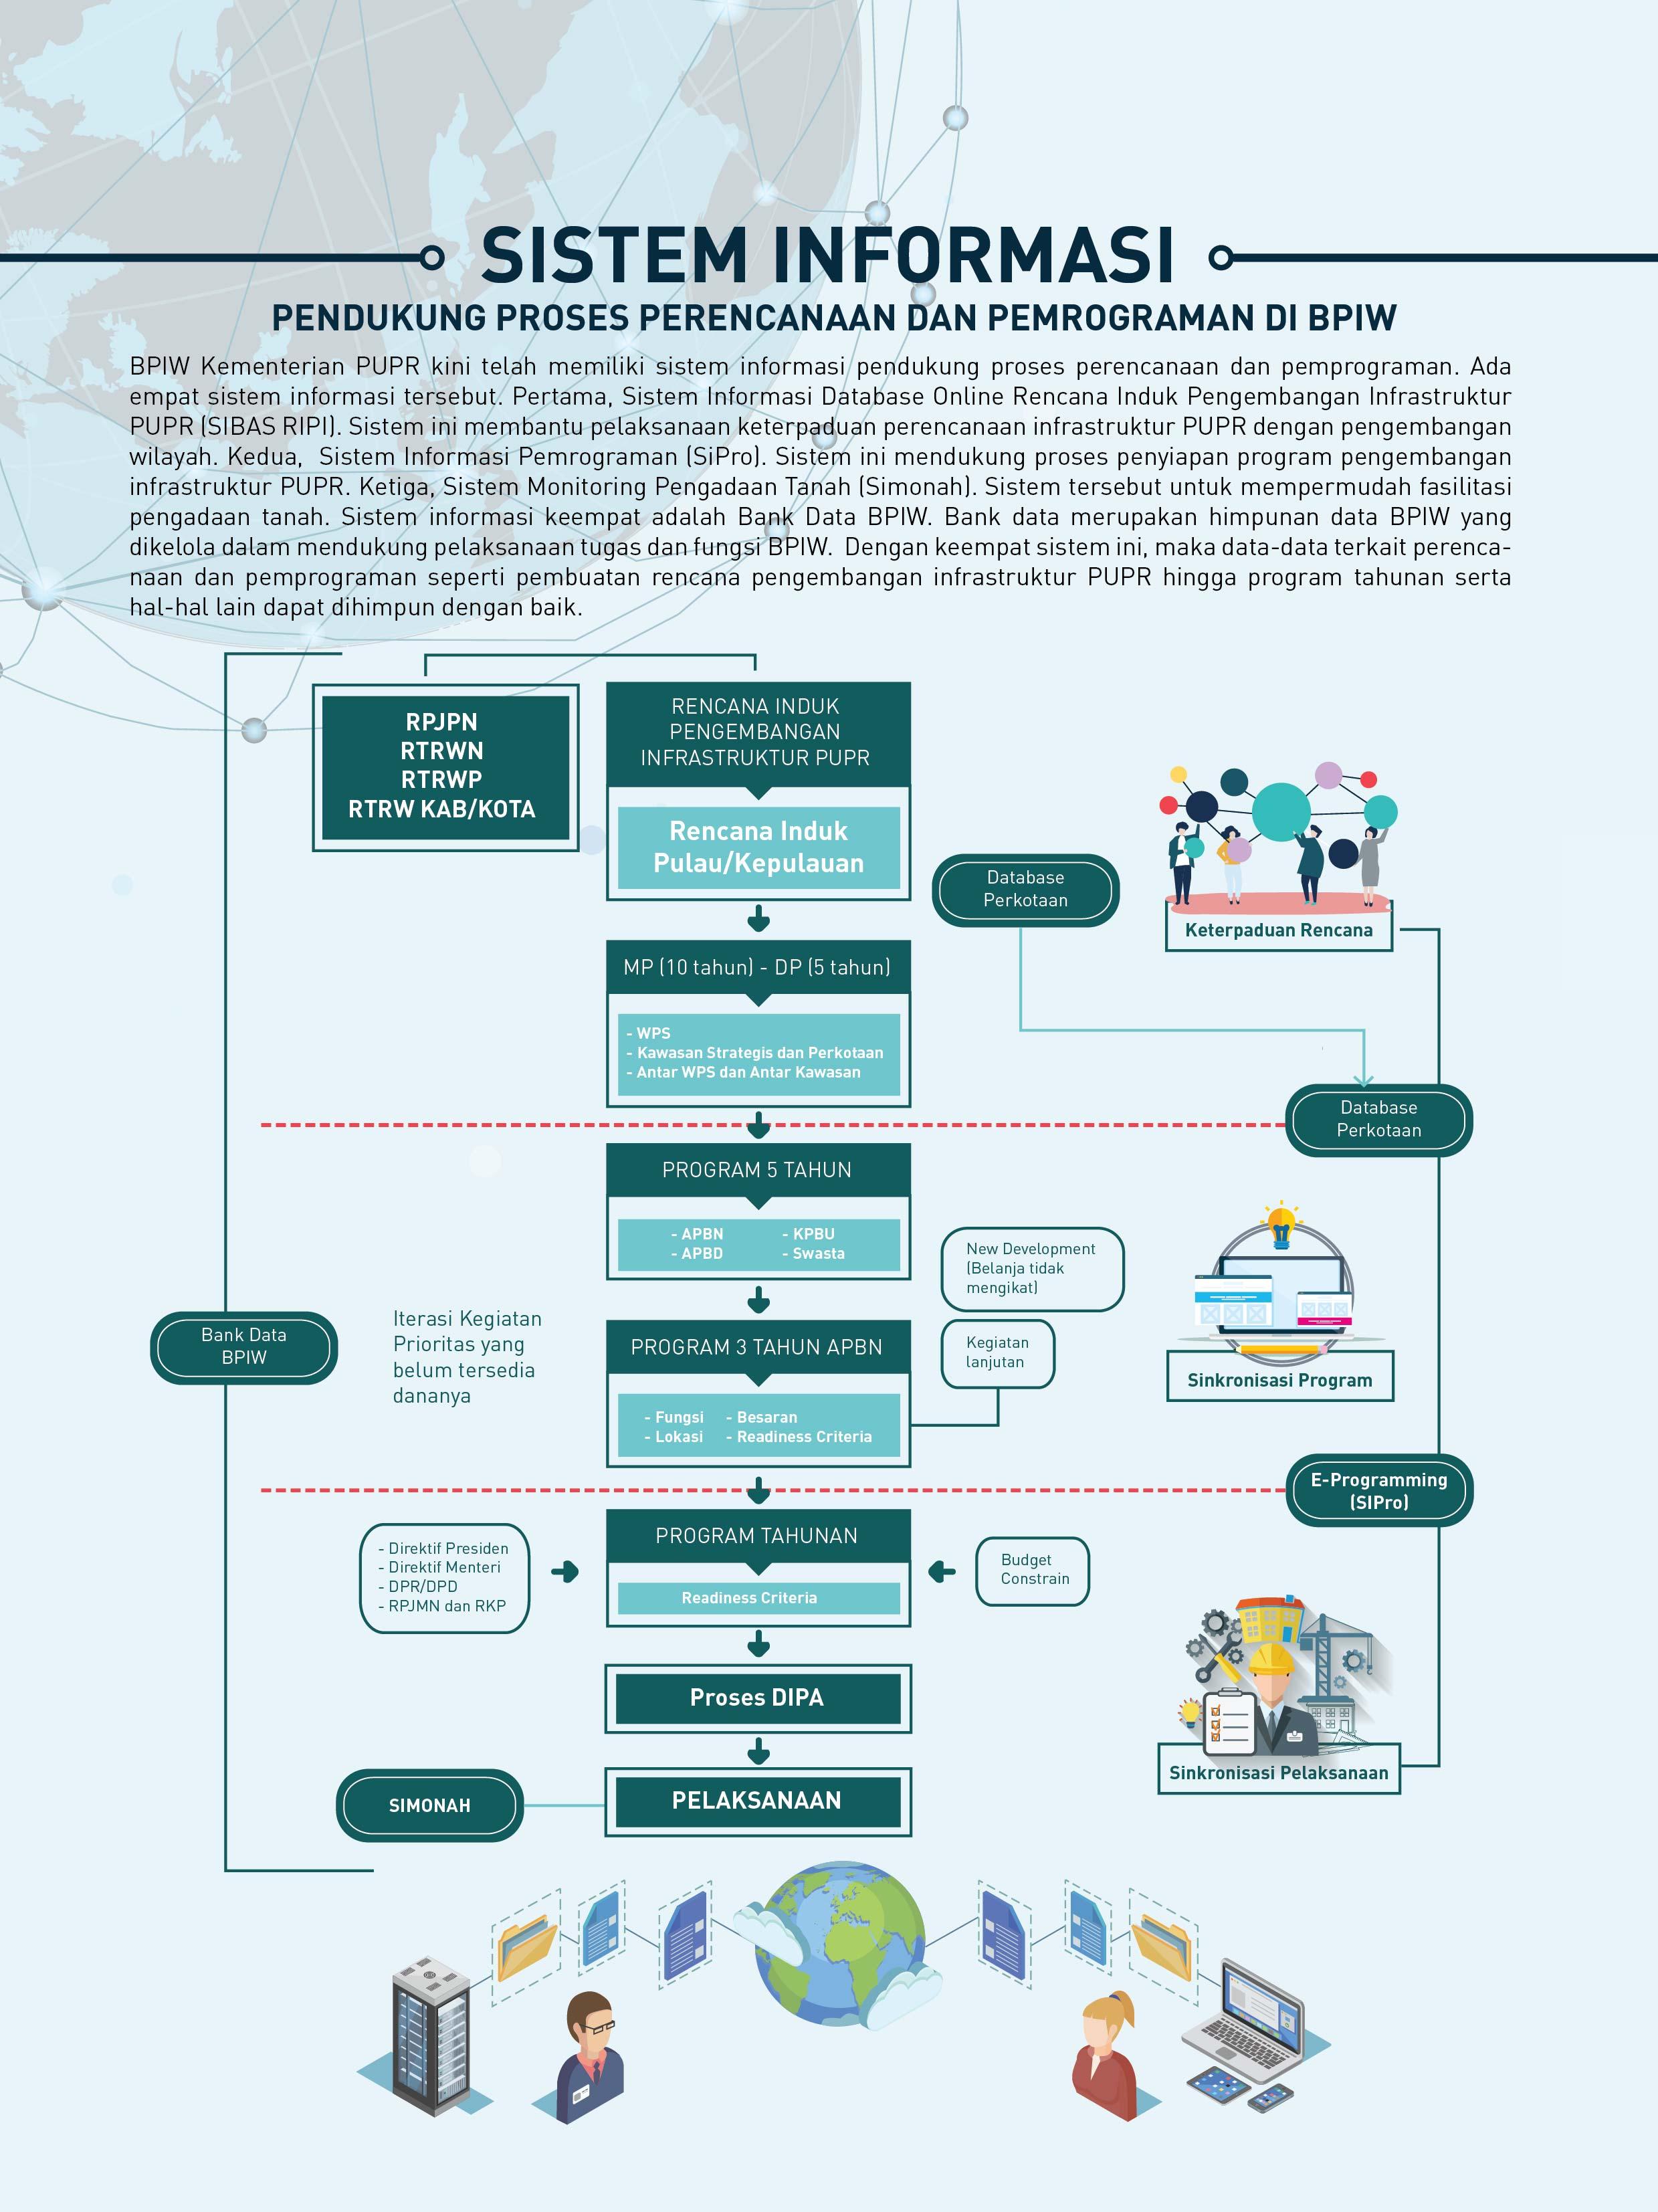 Sistem Informasi BPIW